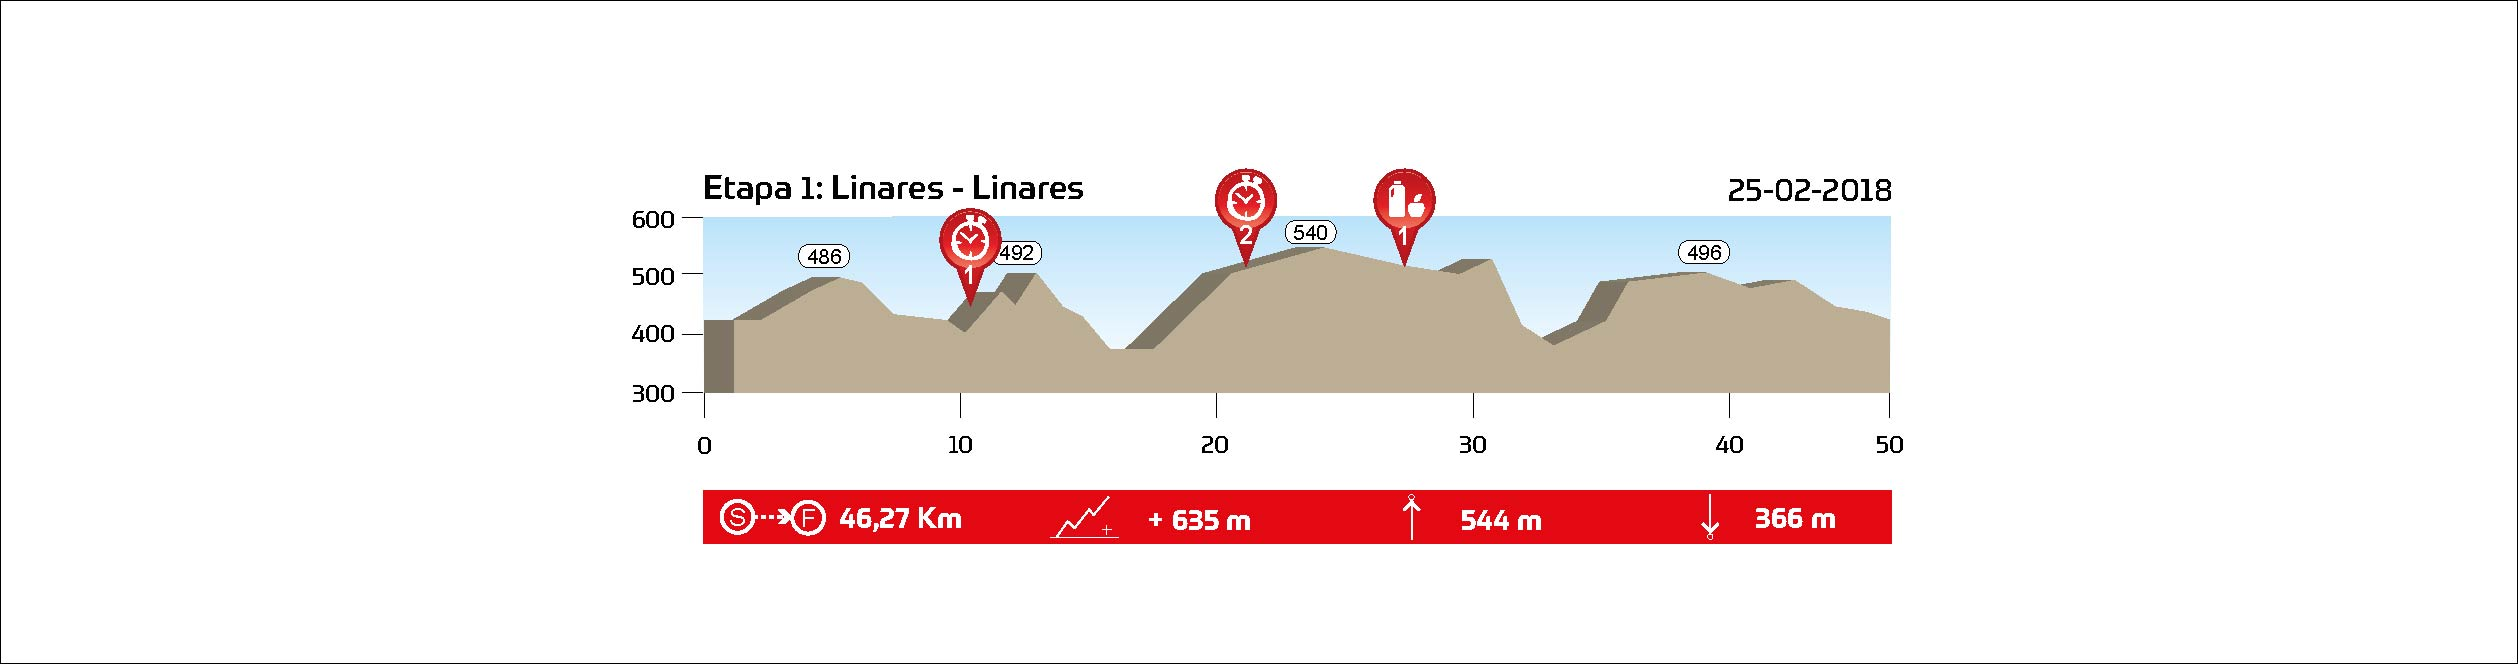 ETAPA 1 (XCT) - Linares - 25.02.2018 - 46,3 km // 635 m+